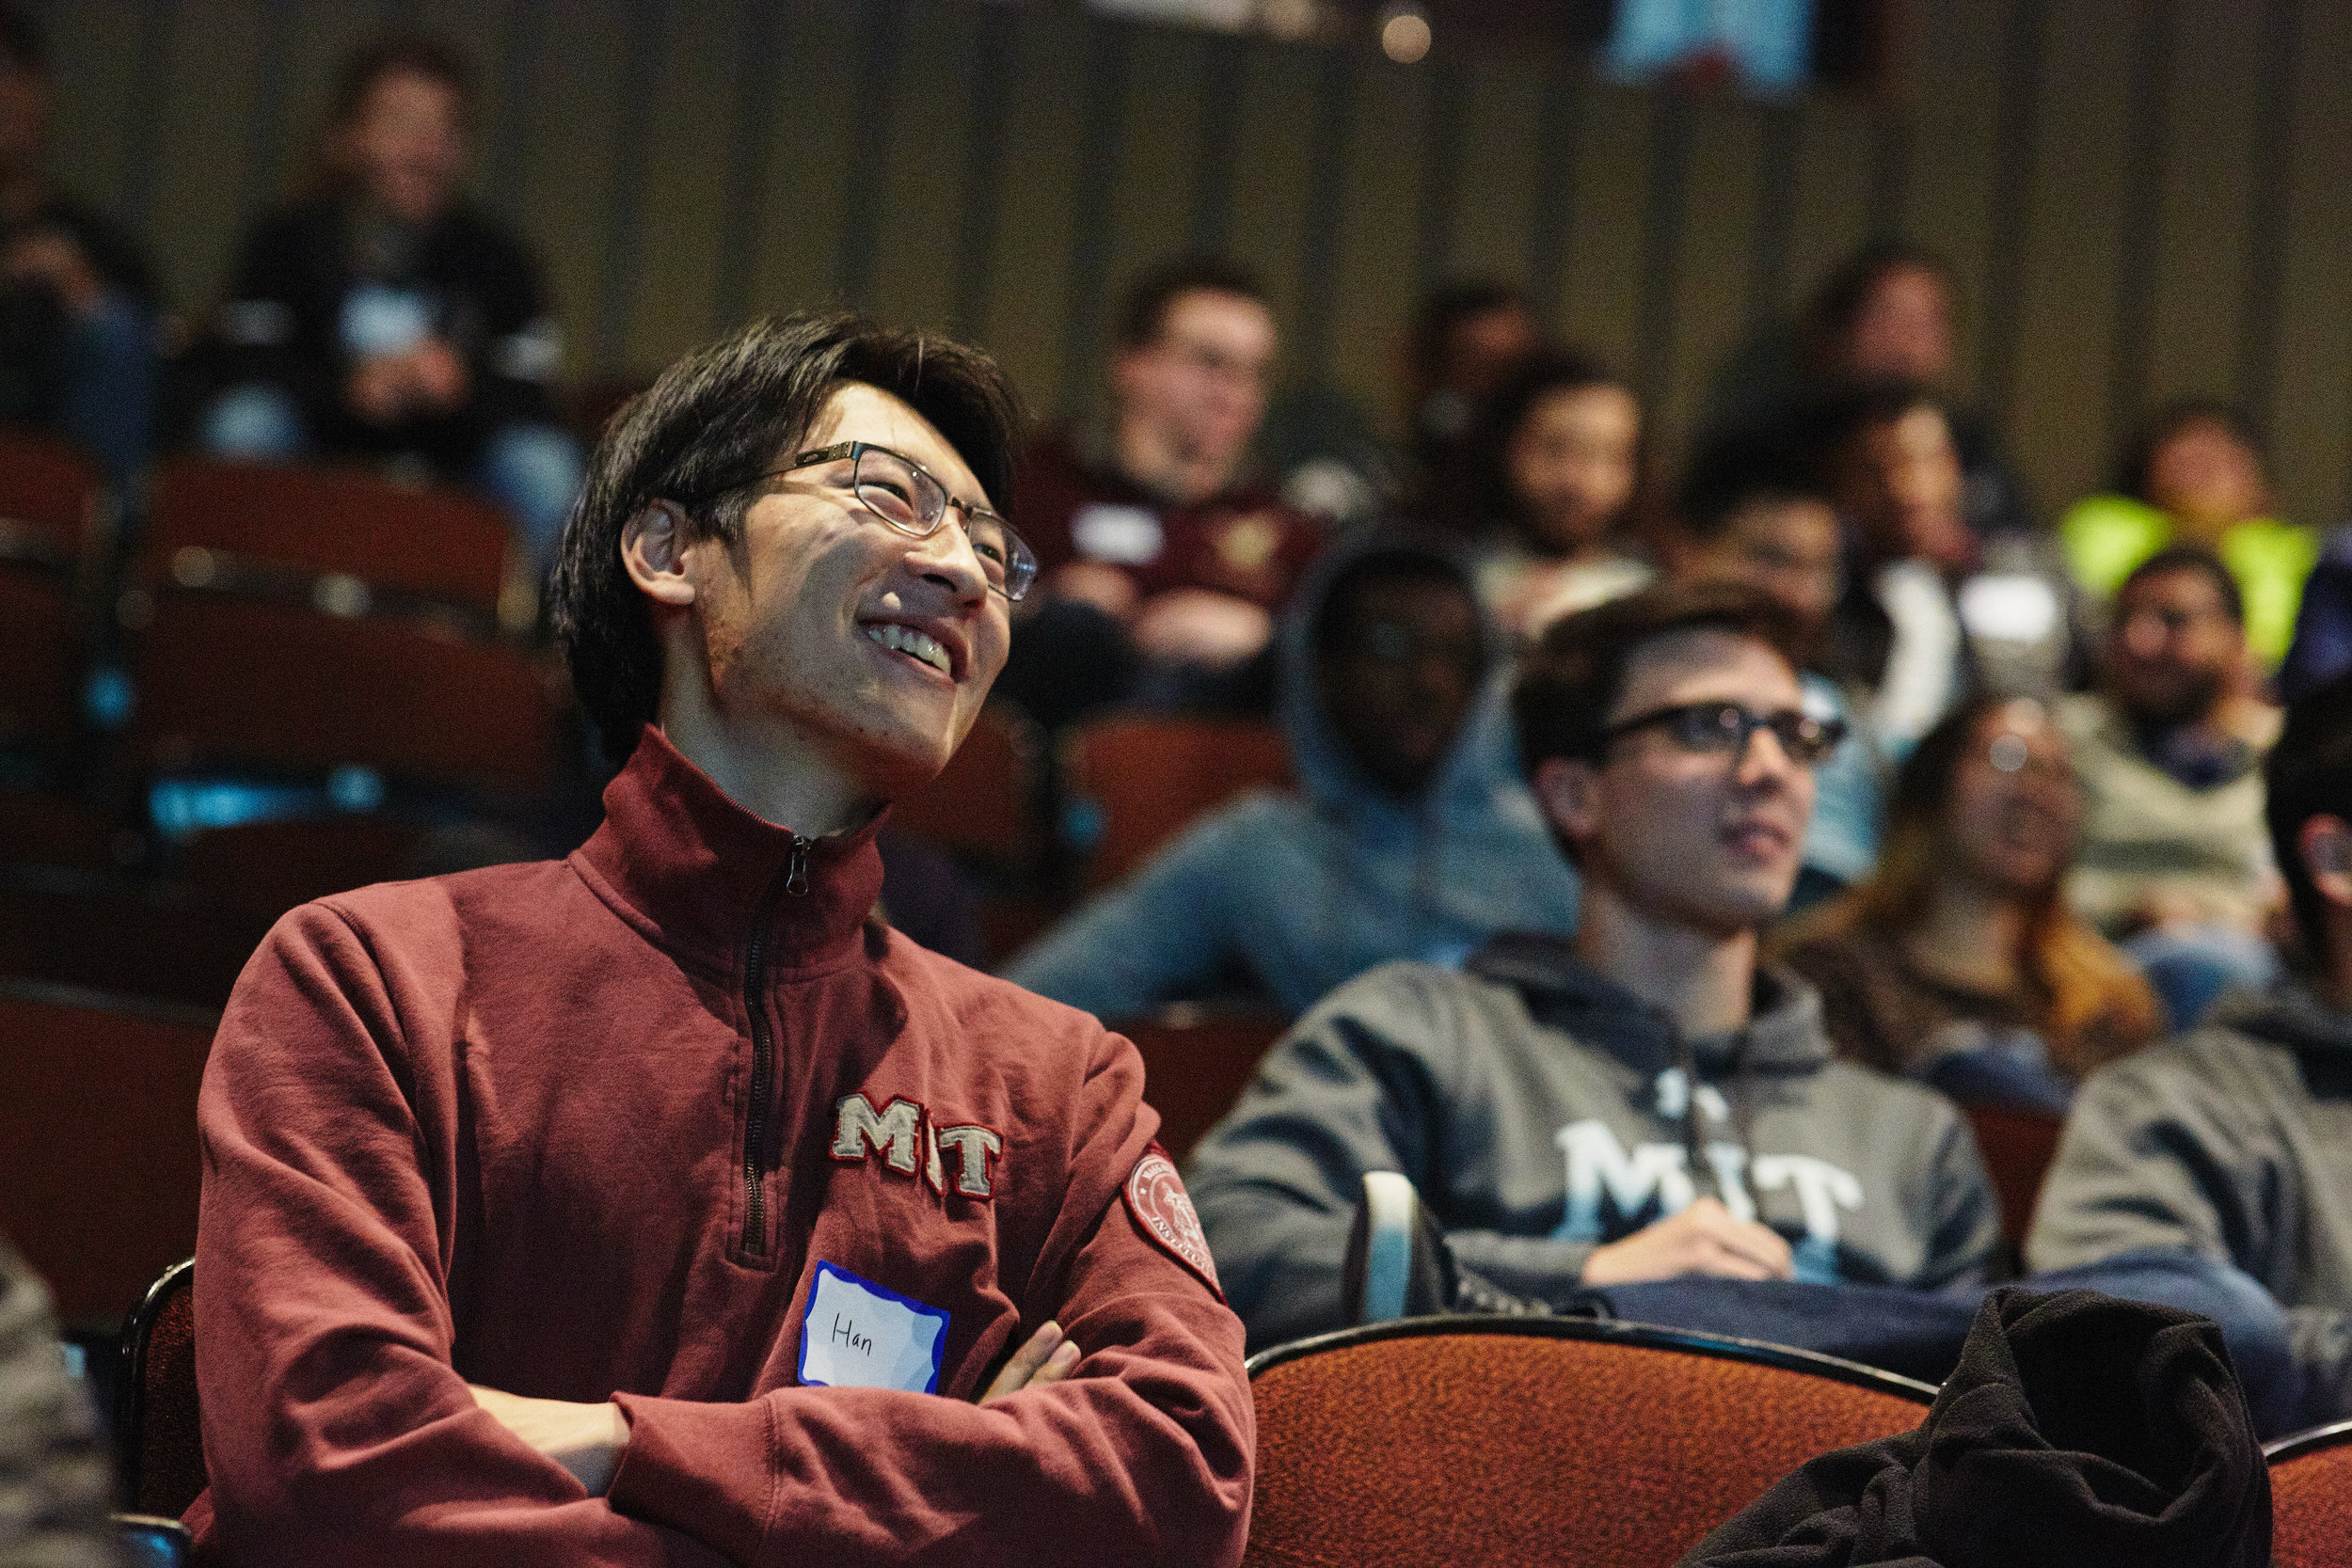 Bose Challenge - 3 Programs - 3 Universities